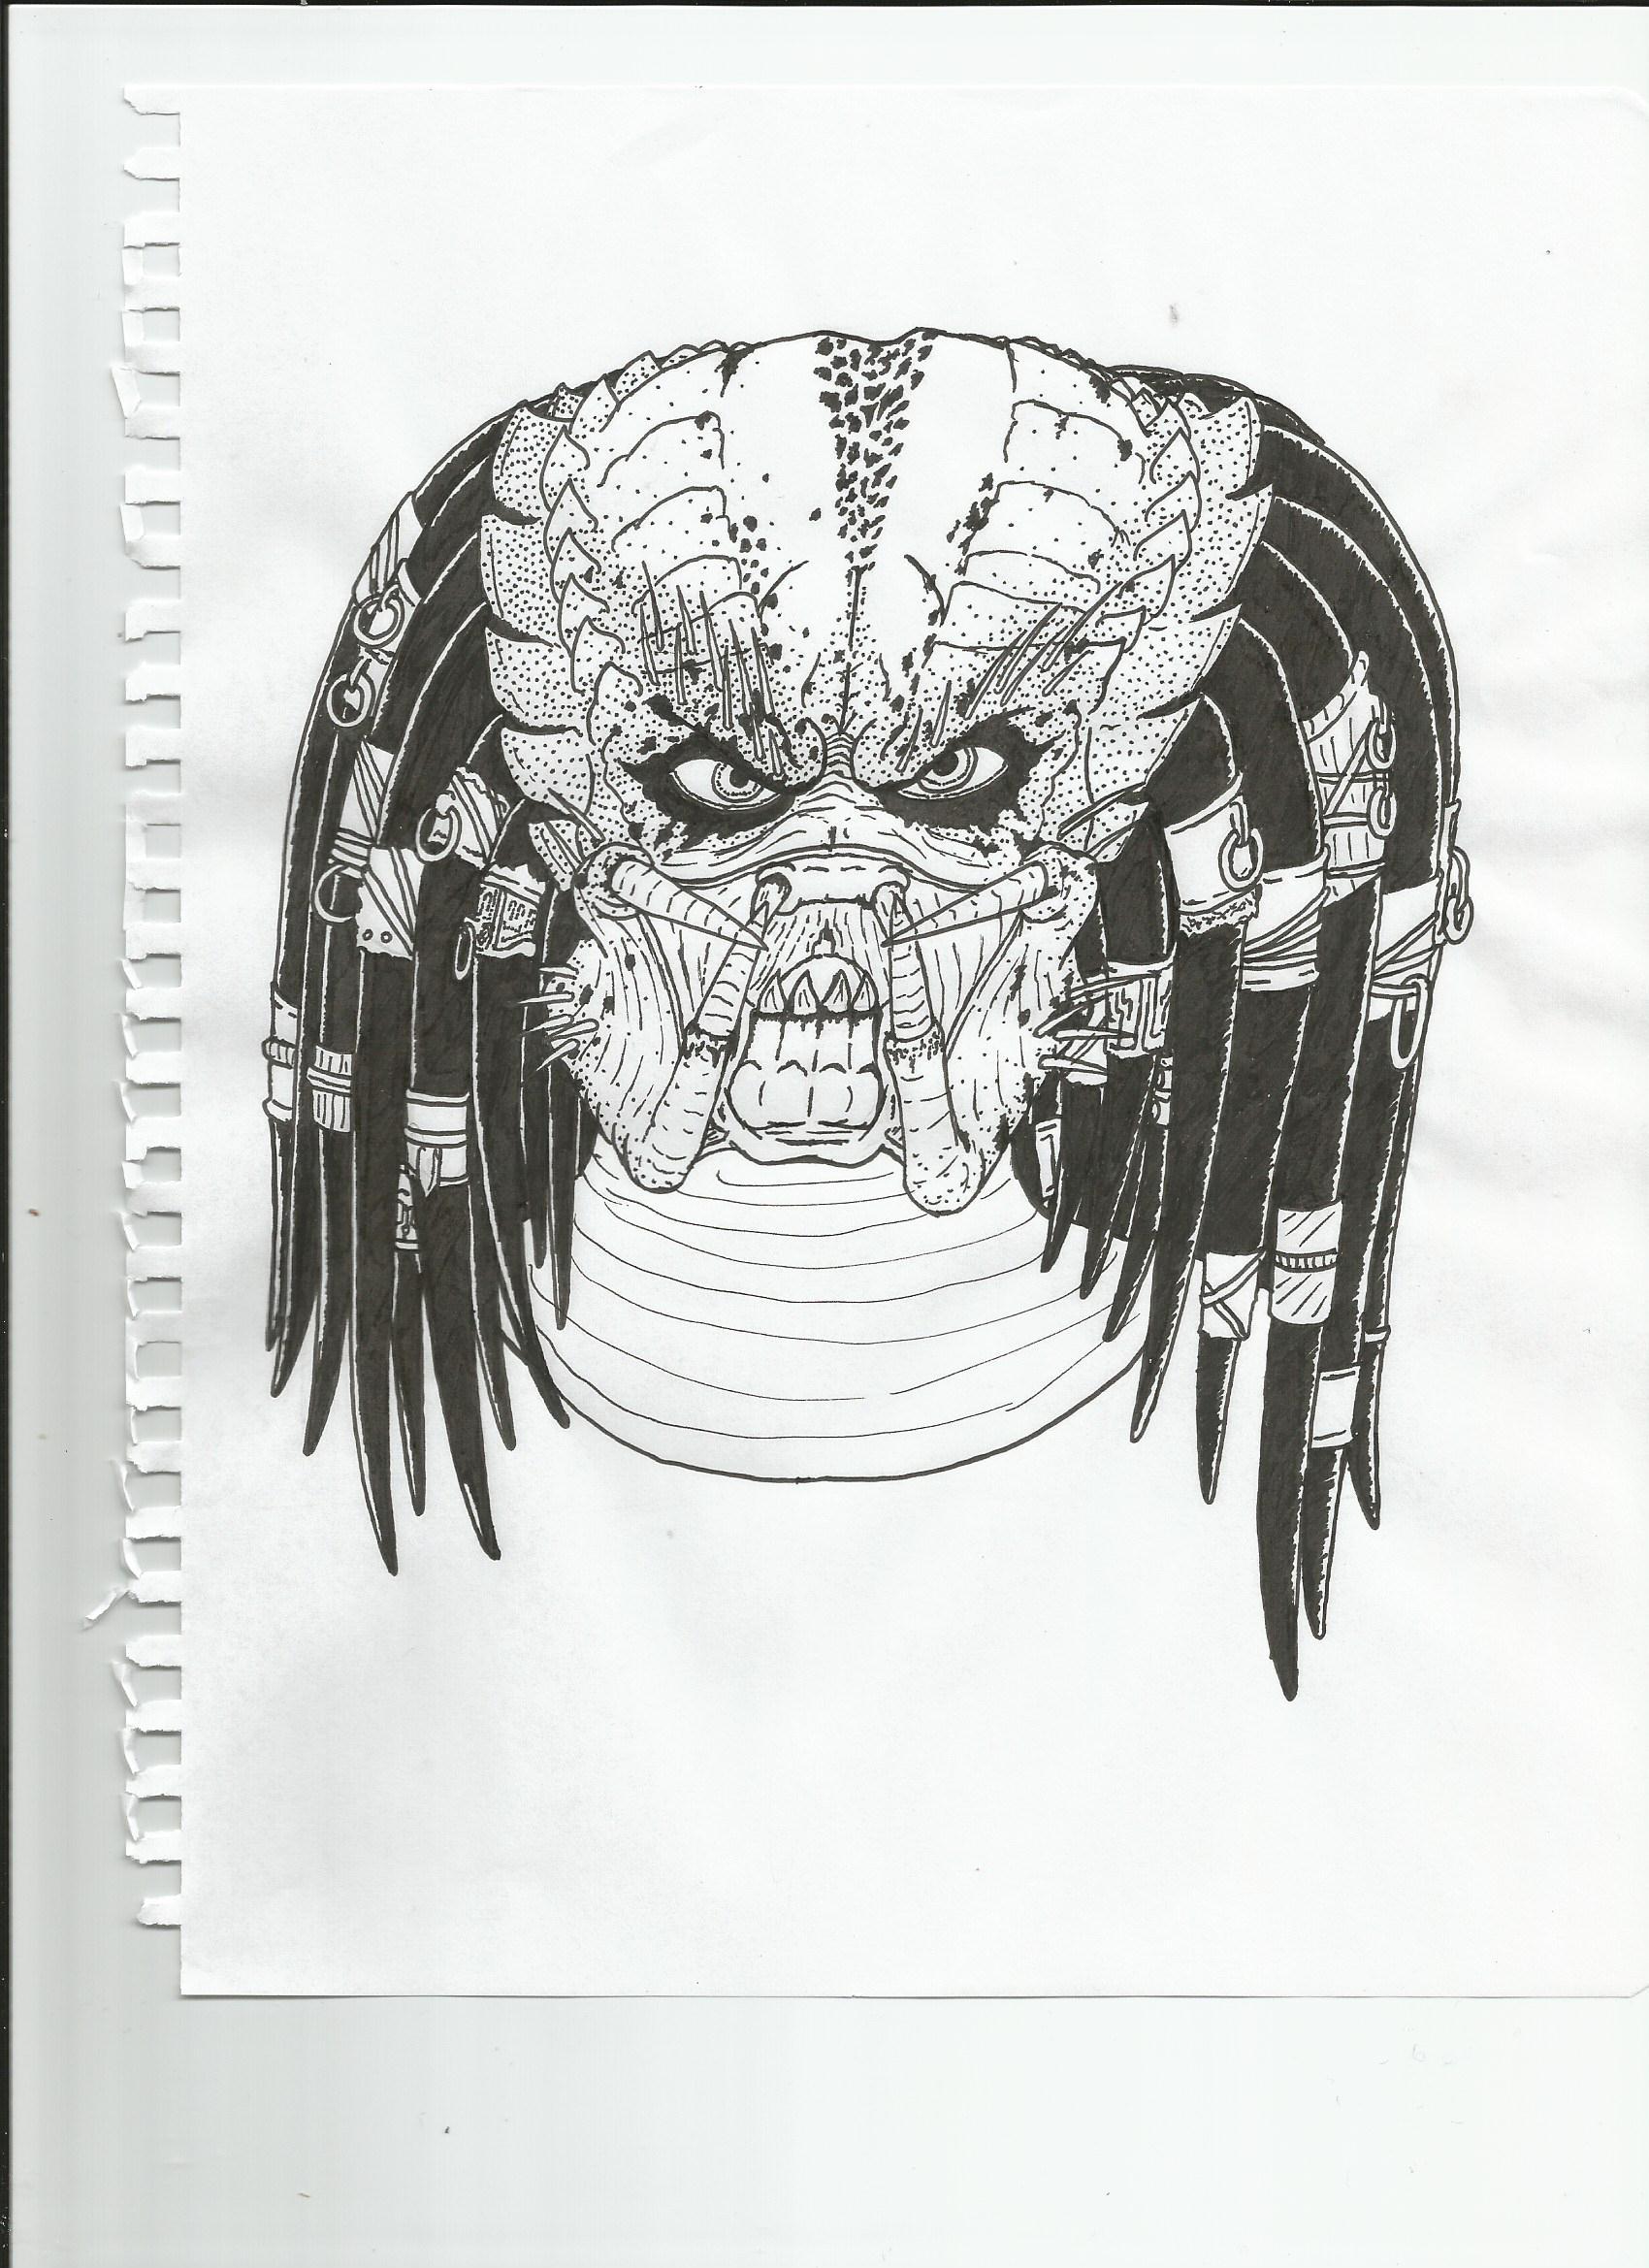 Predator Face by Krovovsky on DeviantArt